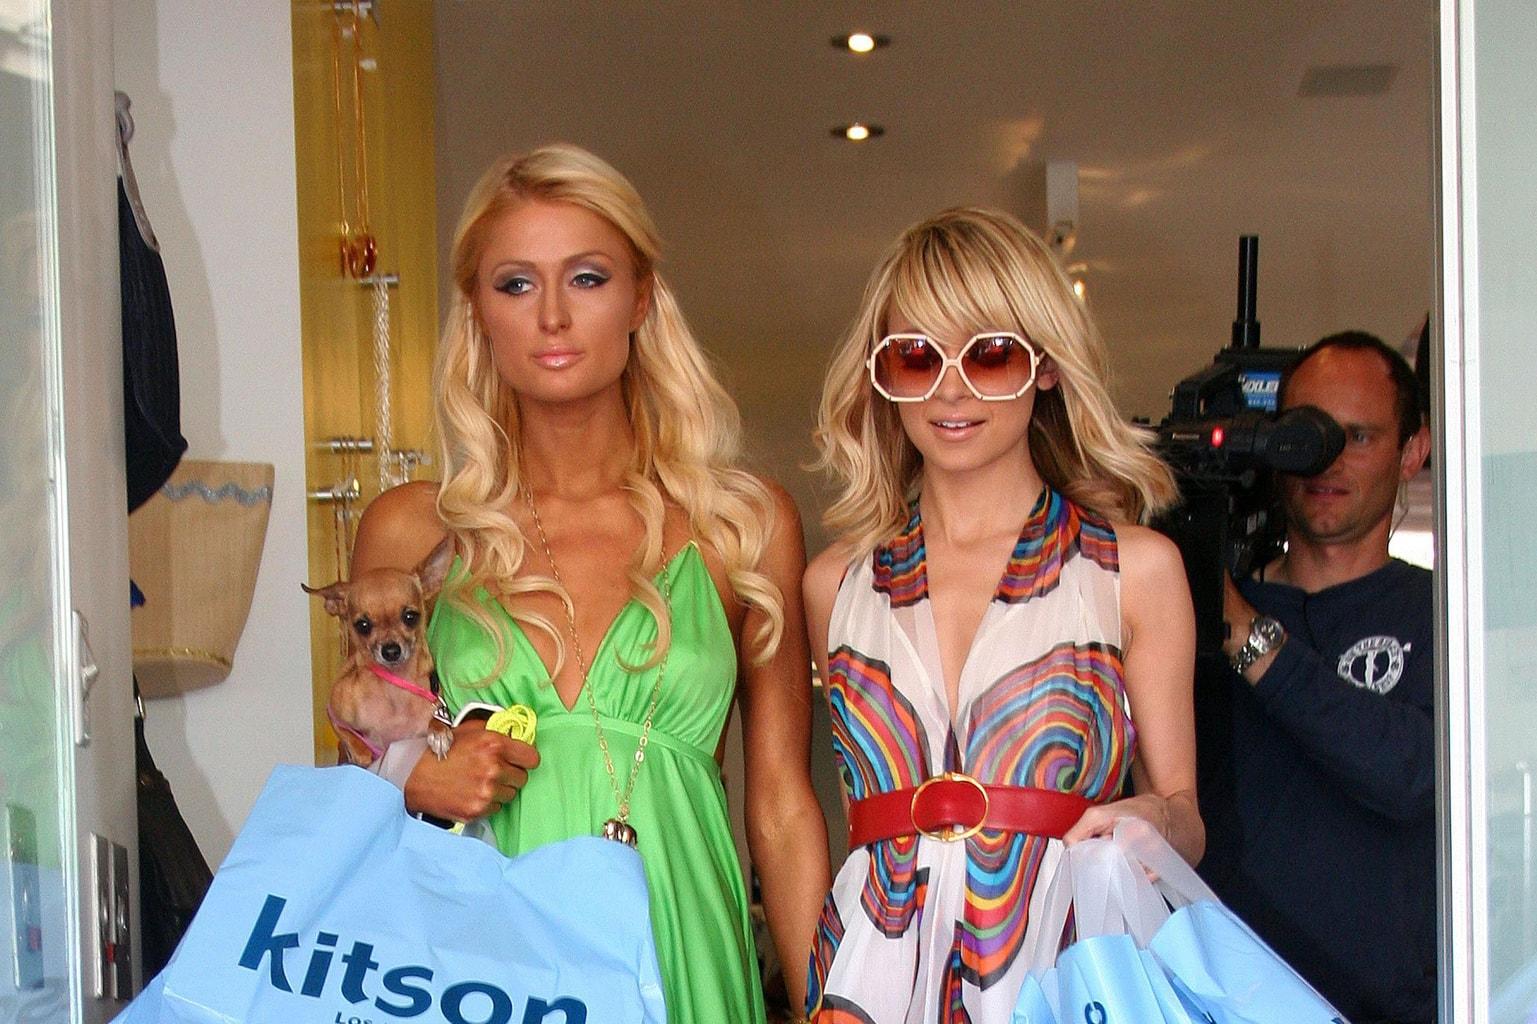 Paris Hilton and Nicole Richie at Kitson